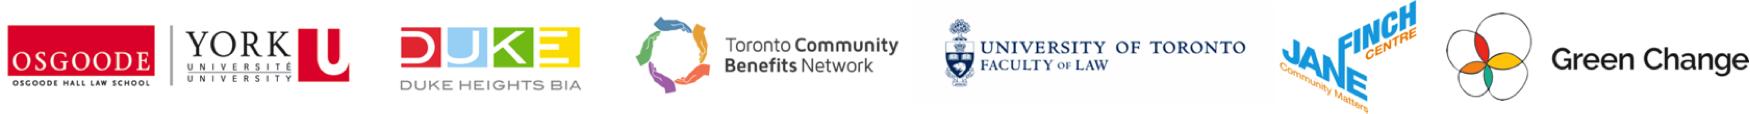 Community Benefits Creating Opportunities Summit Partner Logos